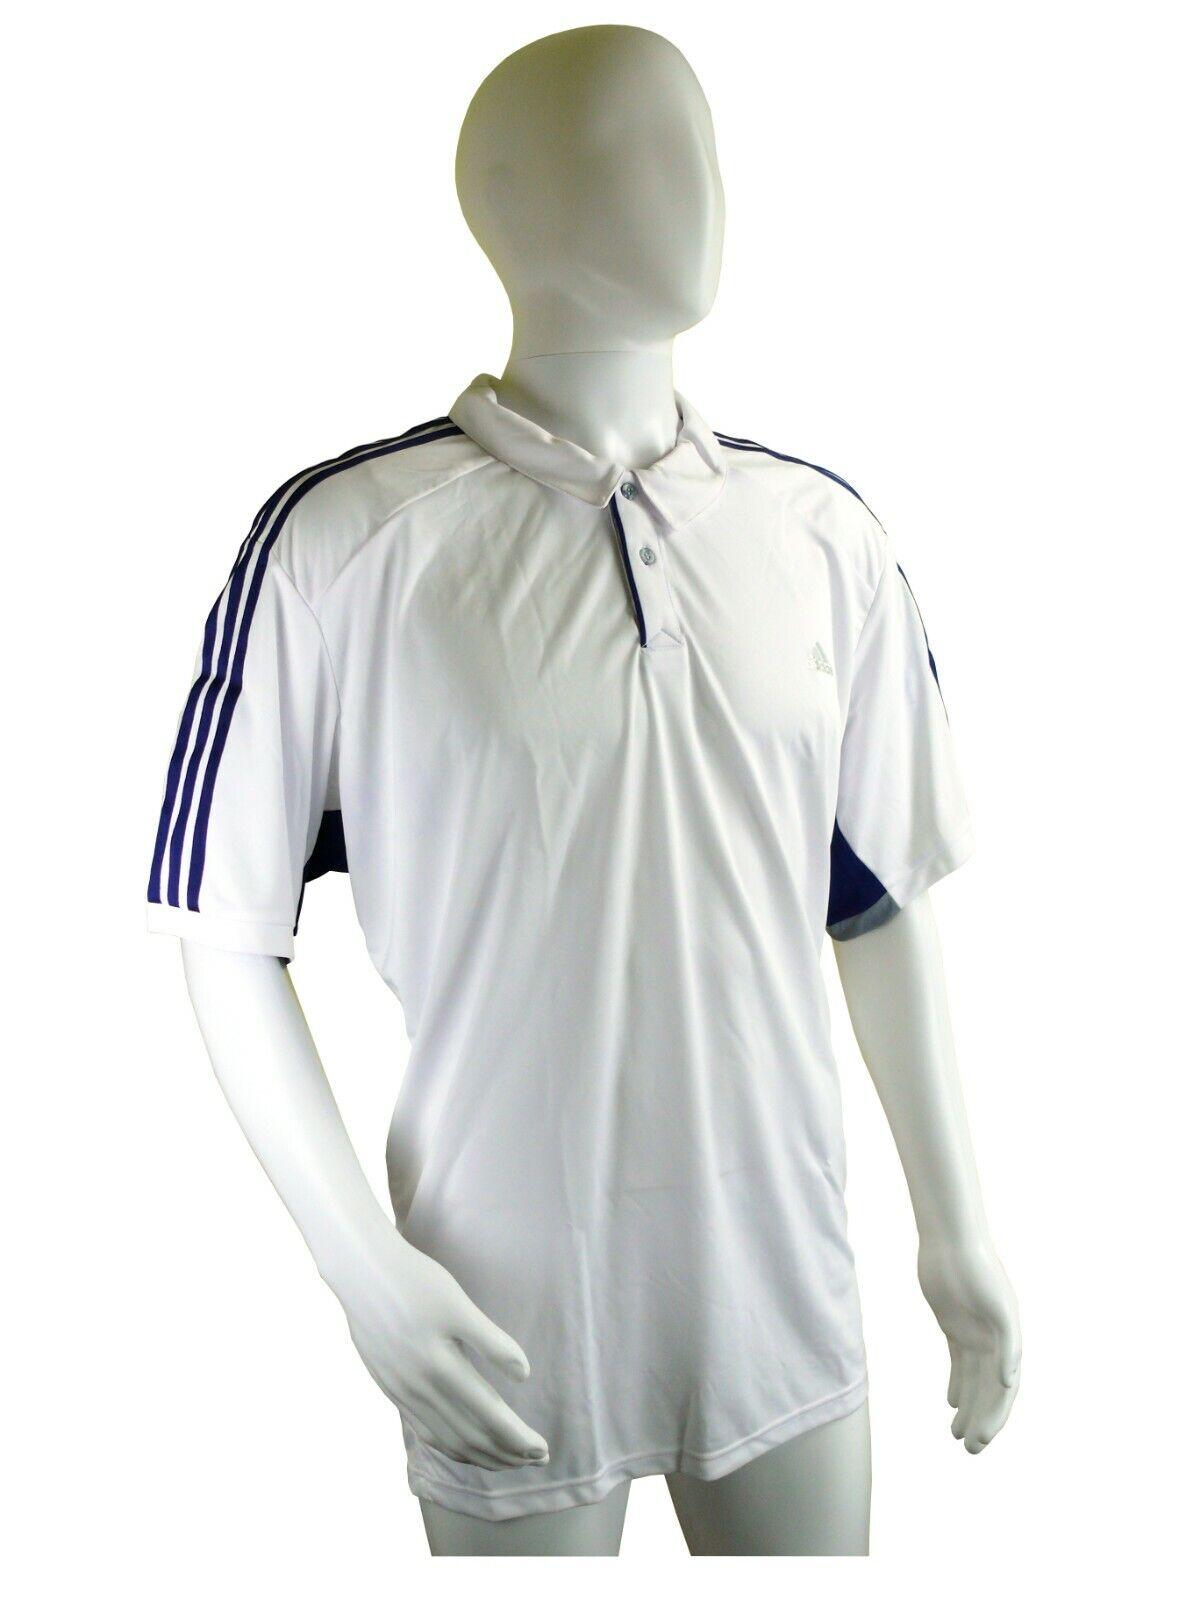 ADIDAS ADIDAS ADIDAS CLIMACOOL 365 Poloshirt, T-Shirt Polo, Sportshirt, Größe 3XL (64-66) 2021ac